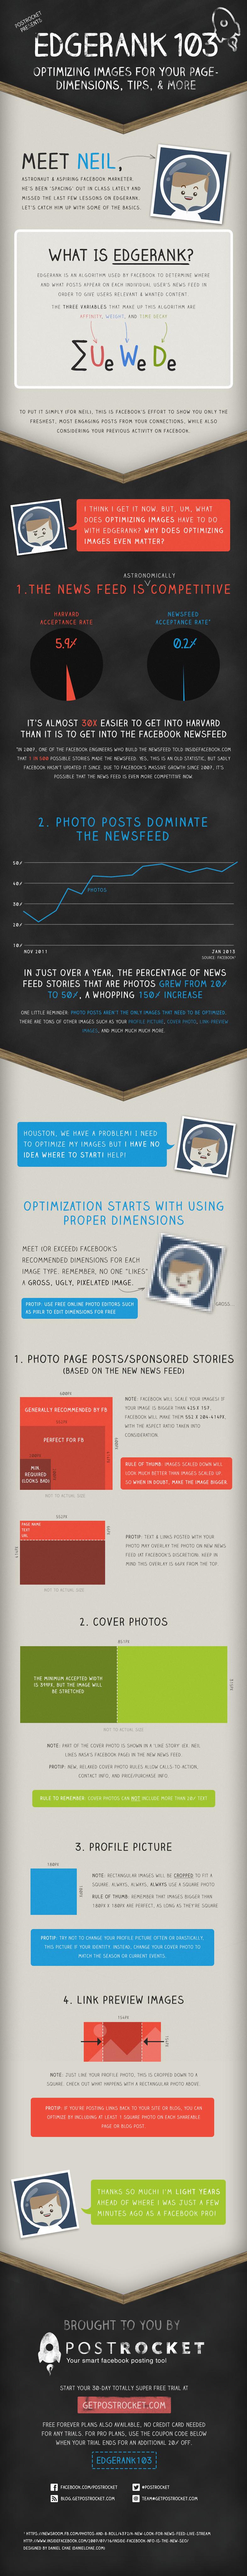 EdgeRank 103 - Como Otimizar imagens para o Facebook